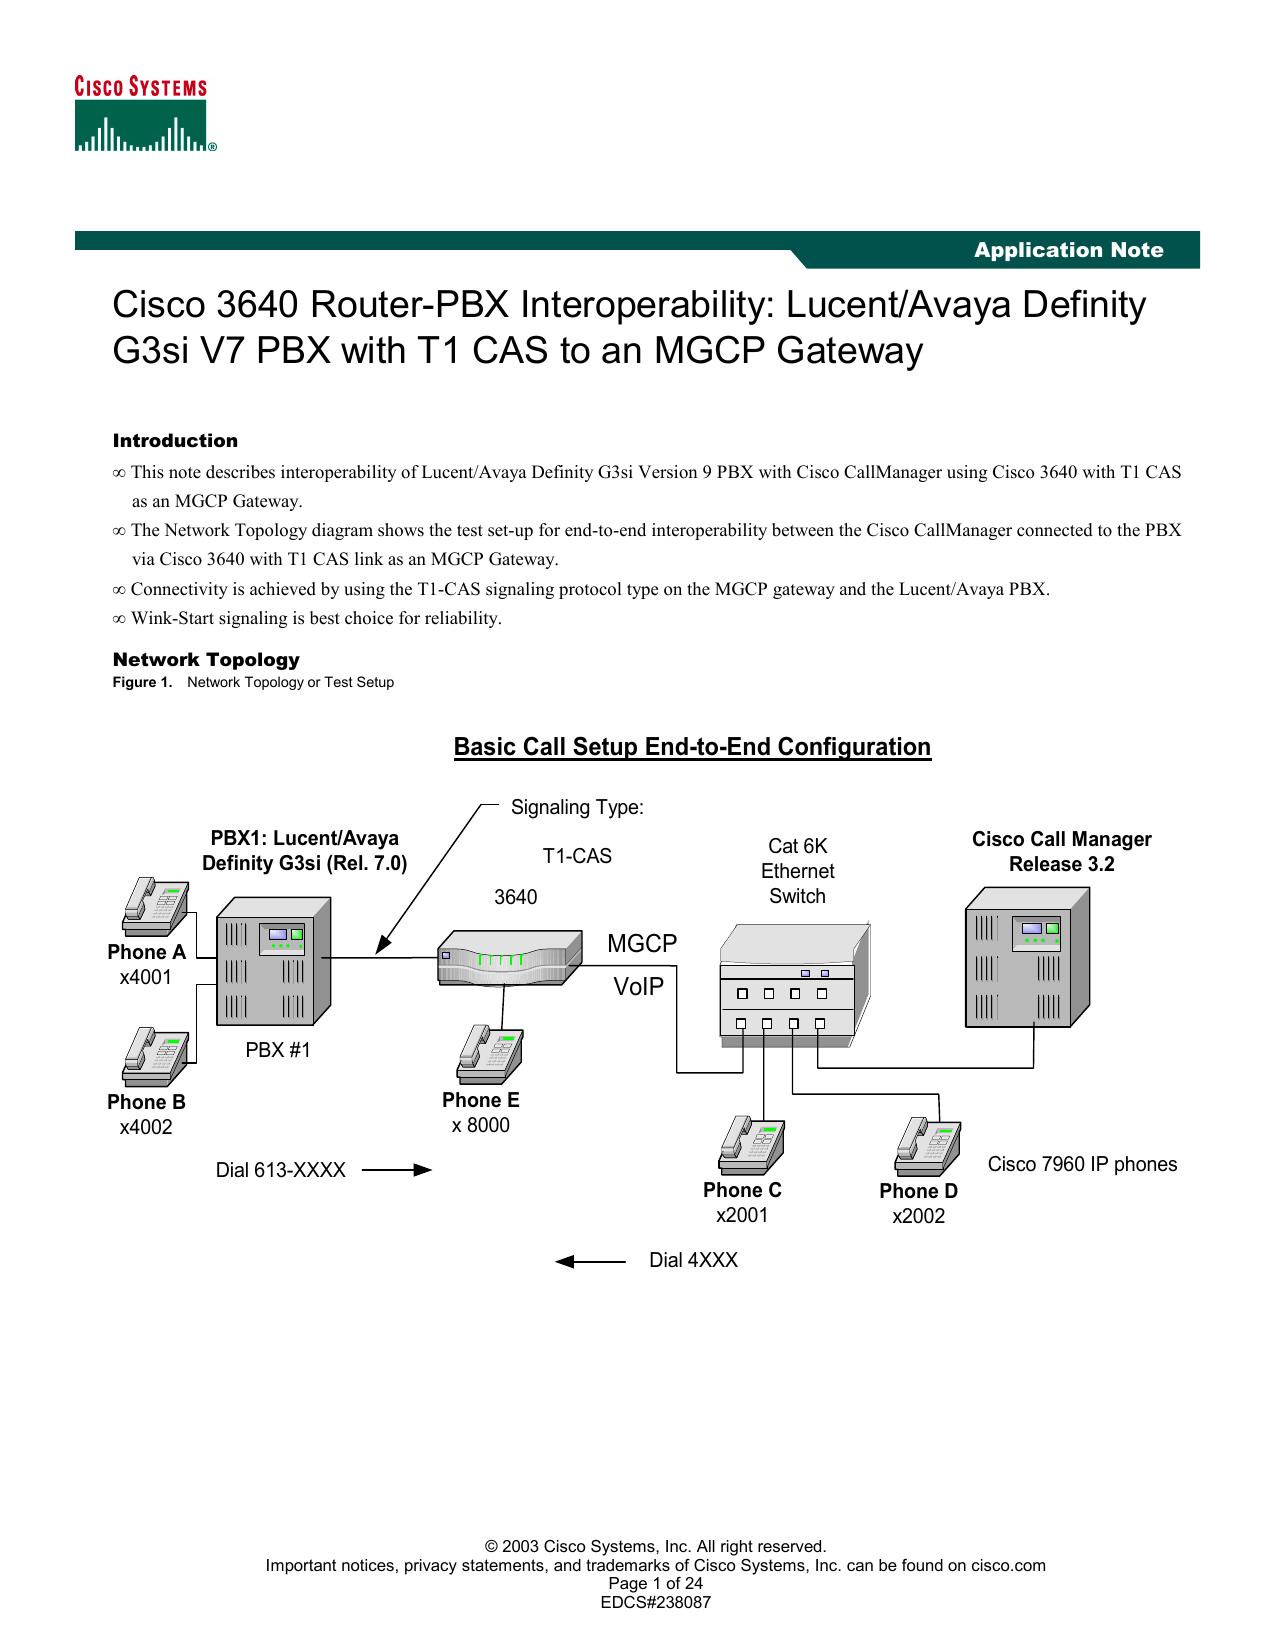 Cisco 3640 Router-PBX Interoperability: Lucent/Avaya Definity